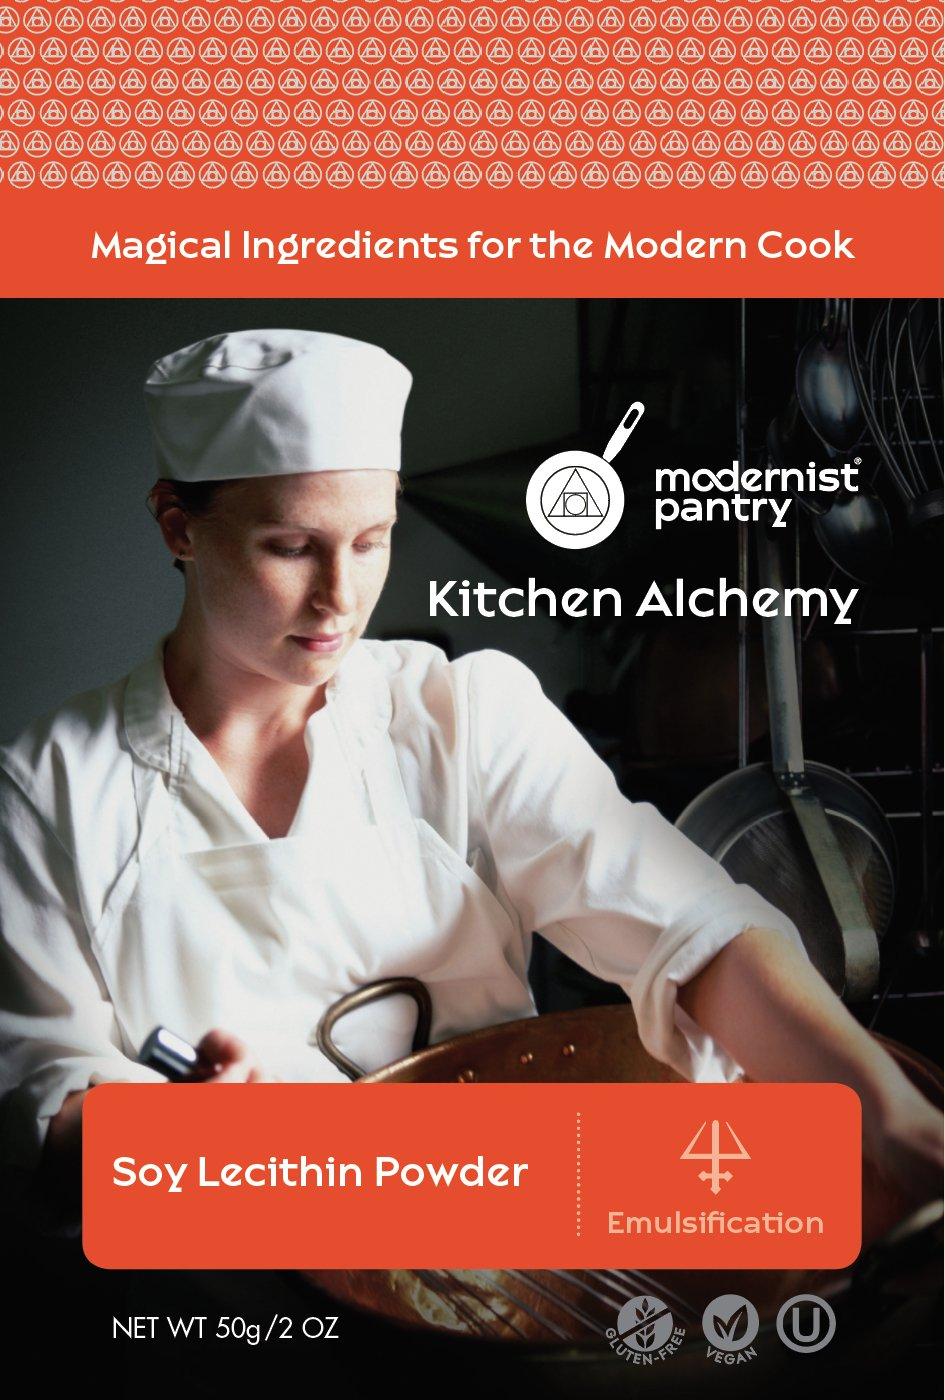 Food Grade Soy Lecithin Powder (Molecular Gastronomy) ☮ Vegan ✡ OU Kosher Certified - 50g/2oz